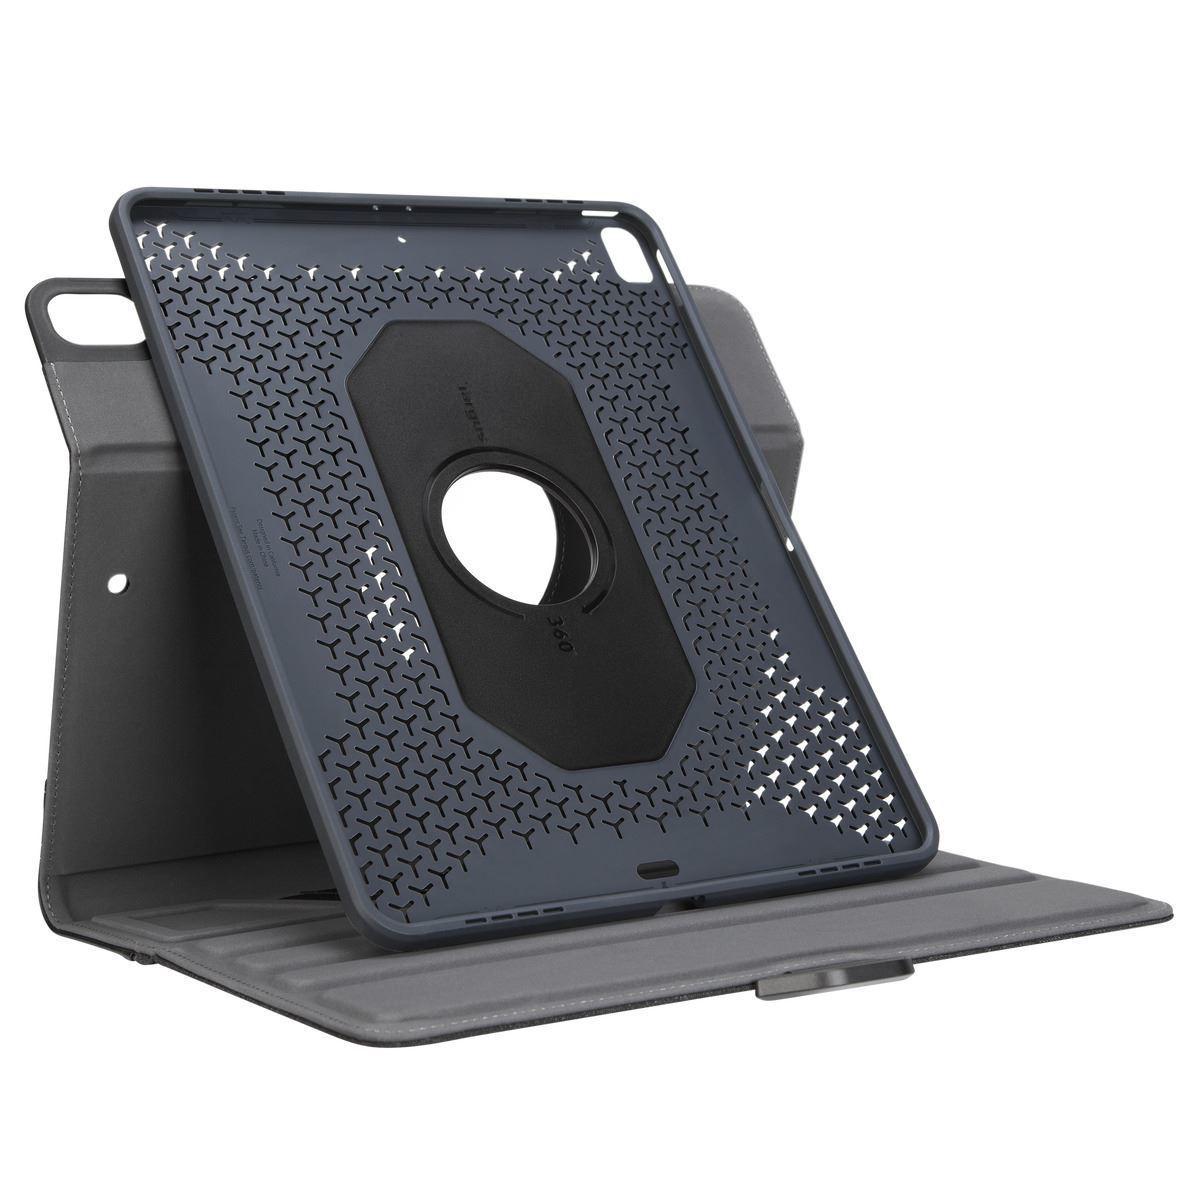 "Targus: VersaVu Signature Case for Apple 12.9"" iPad Pro (2018) - Black image"